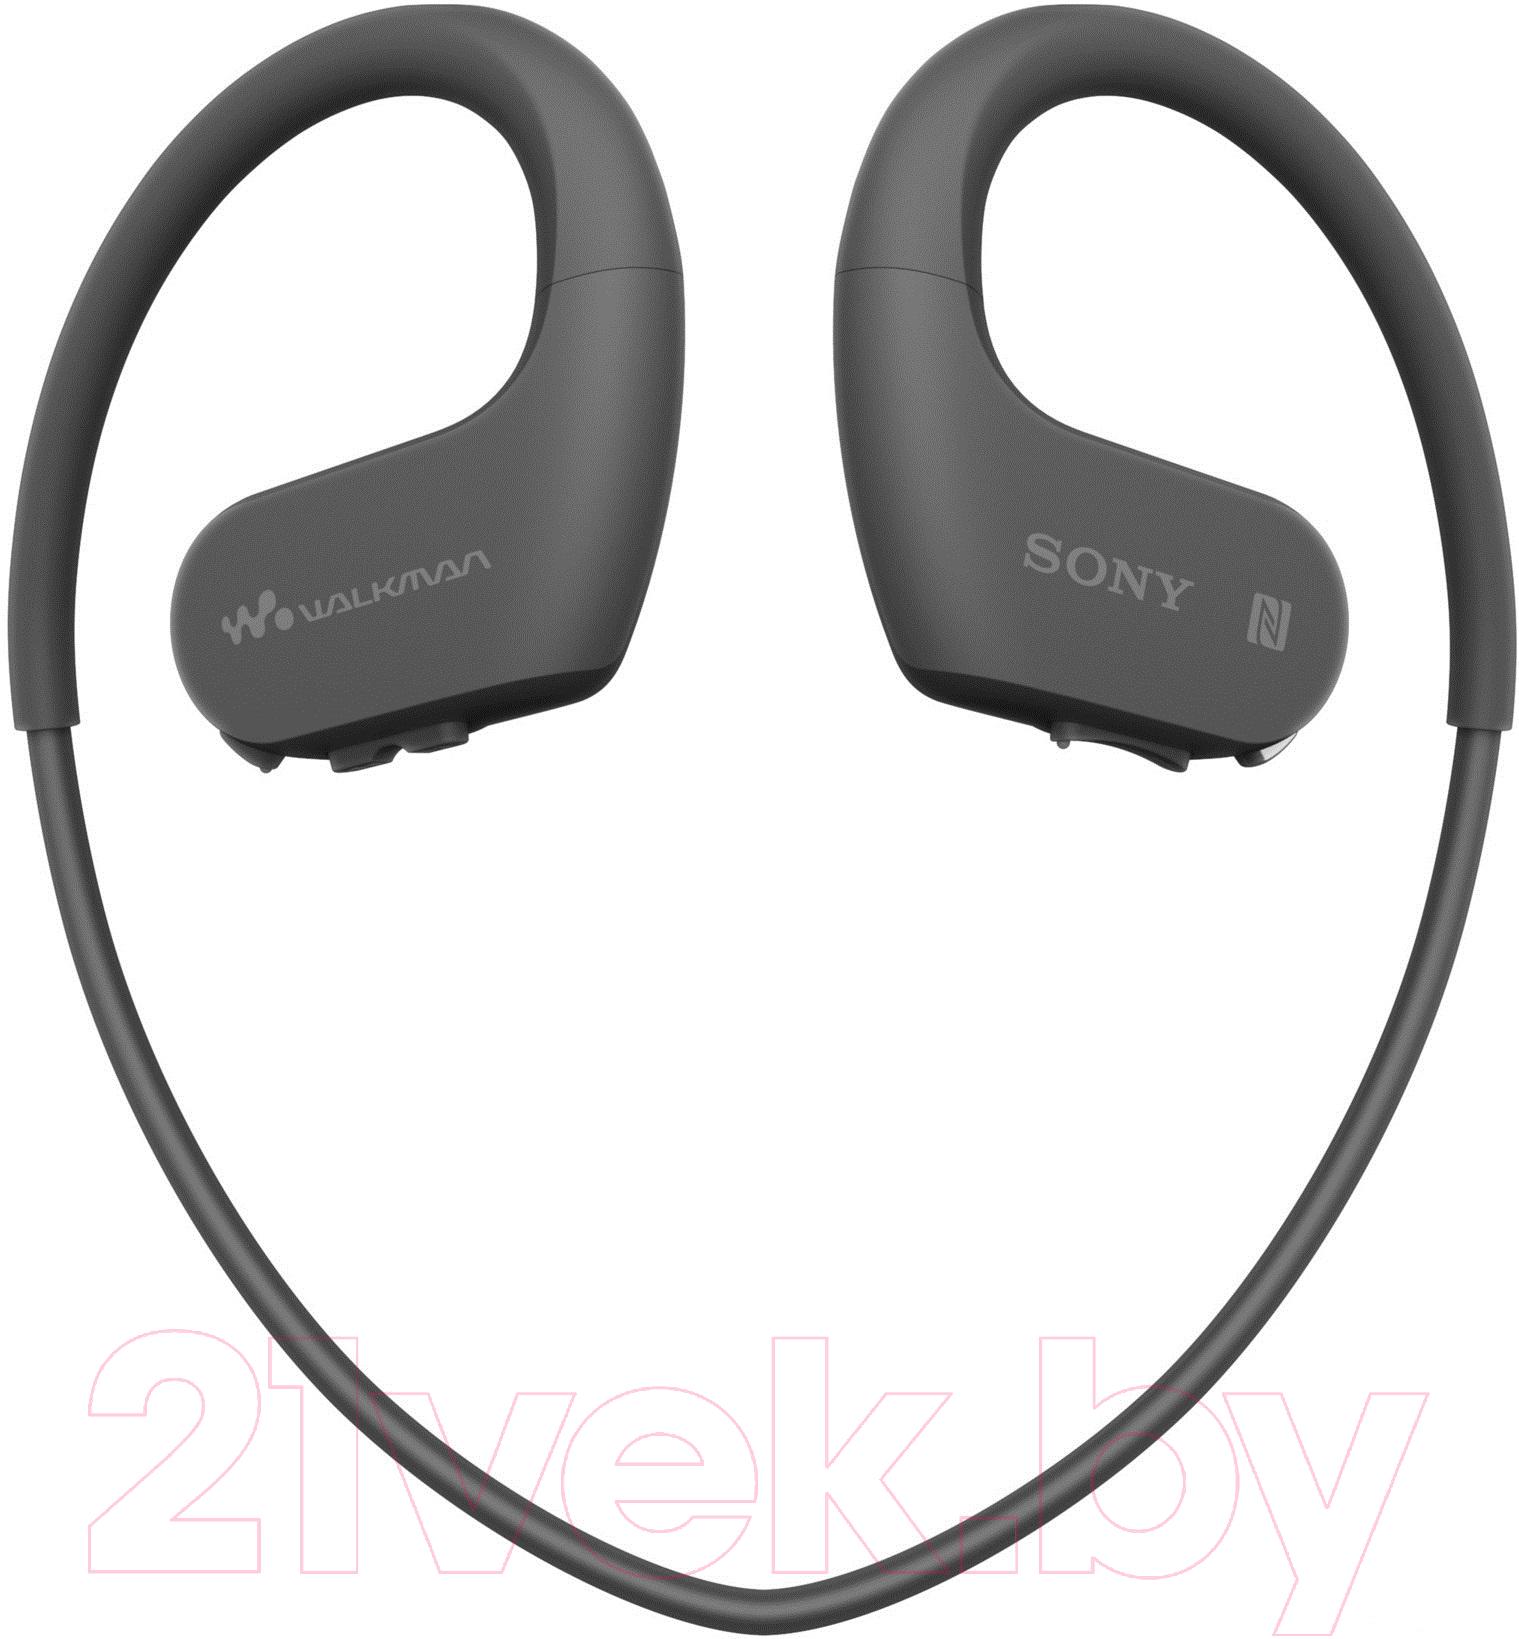 Купить Наушники-плеер Sony, Walkman NW-WS625B (черный), Китай